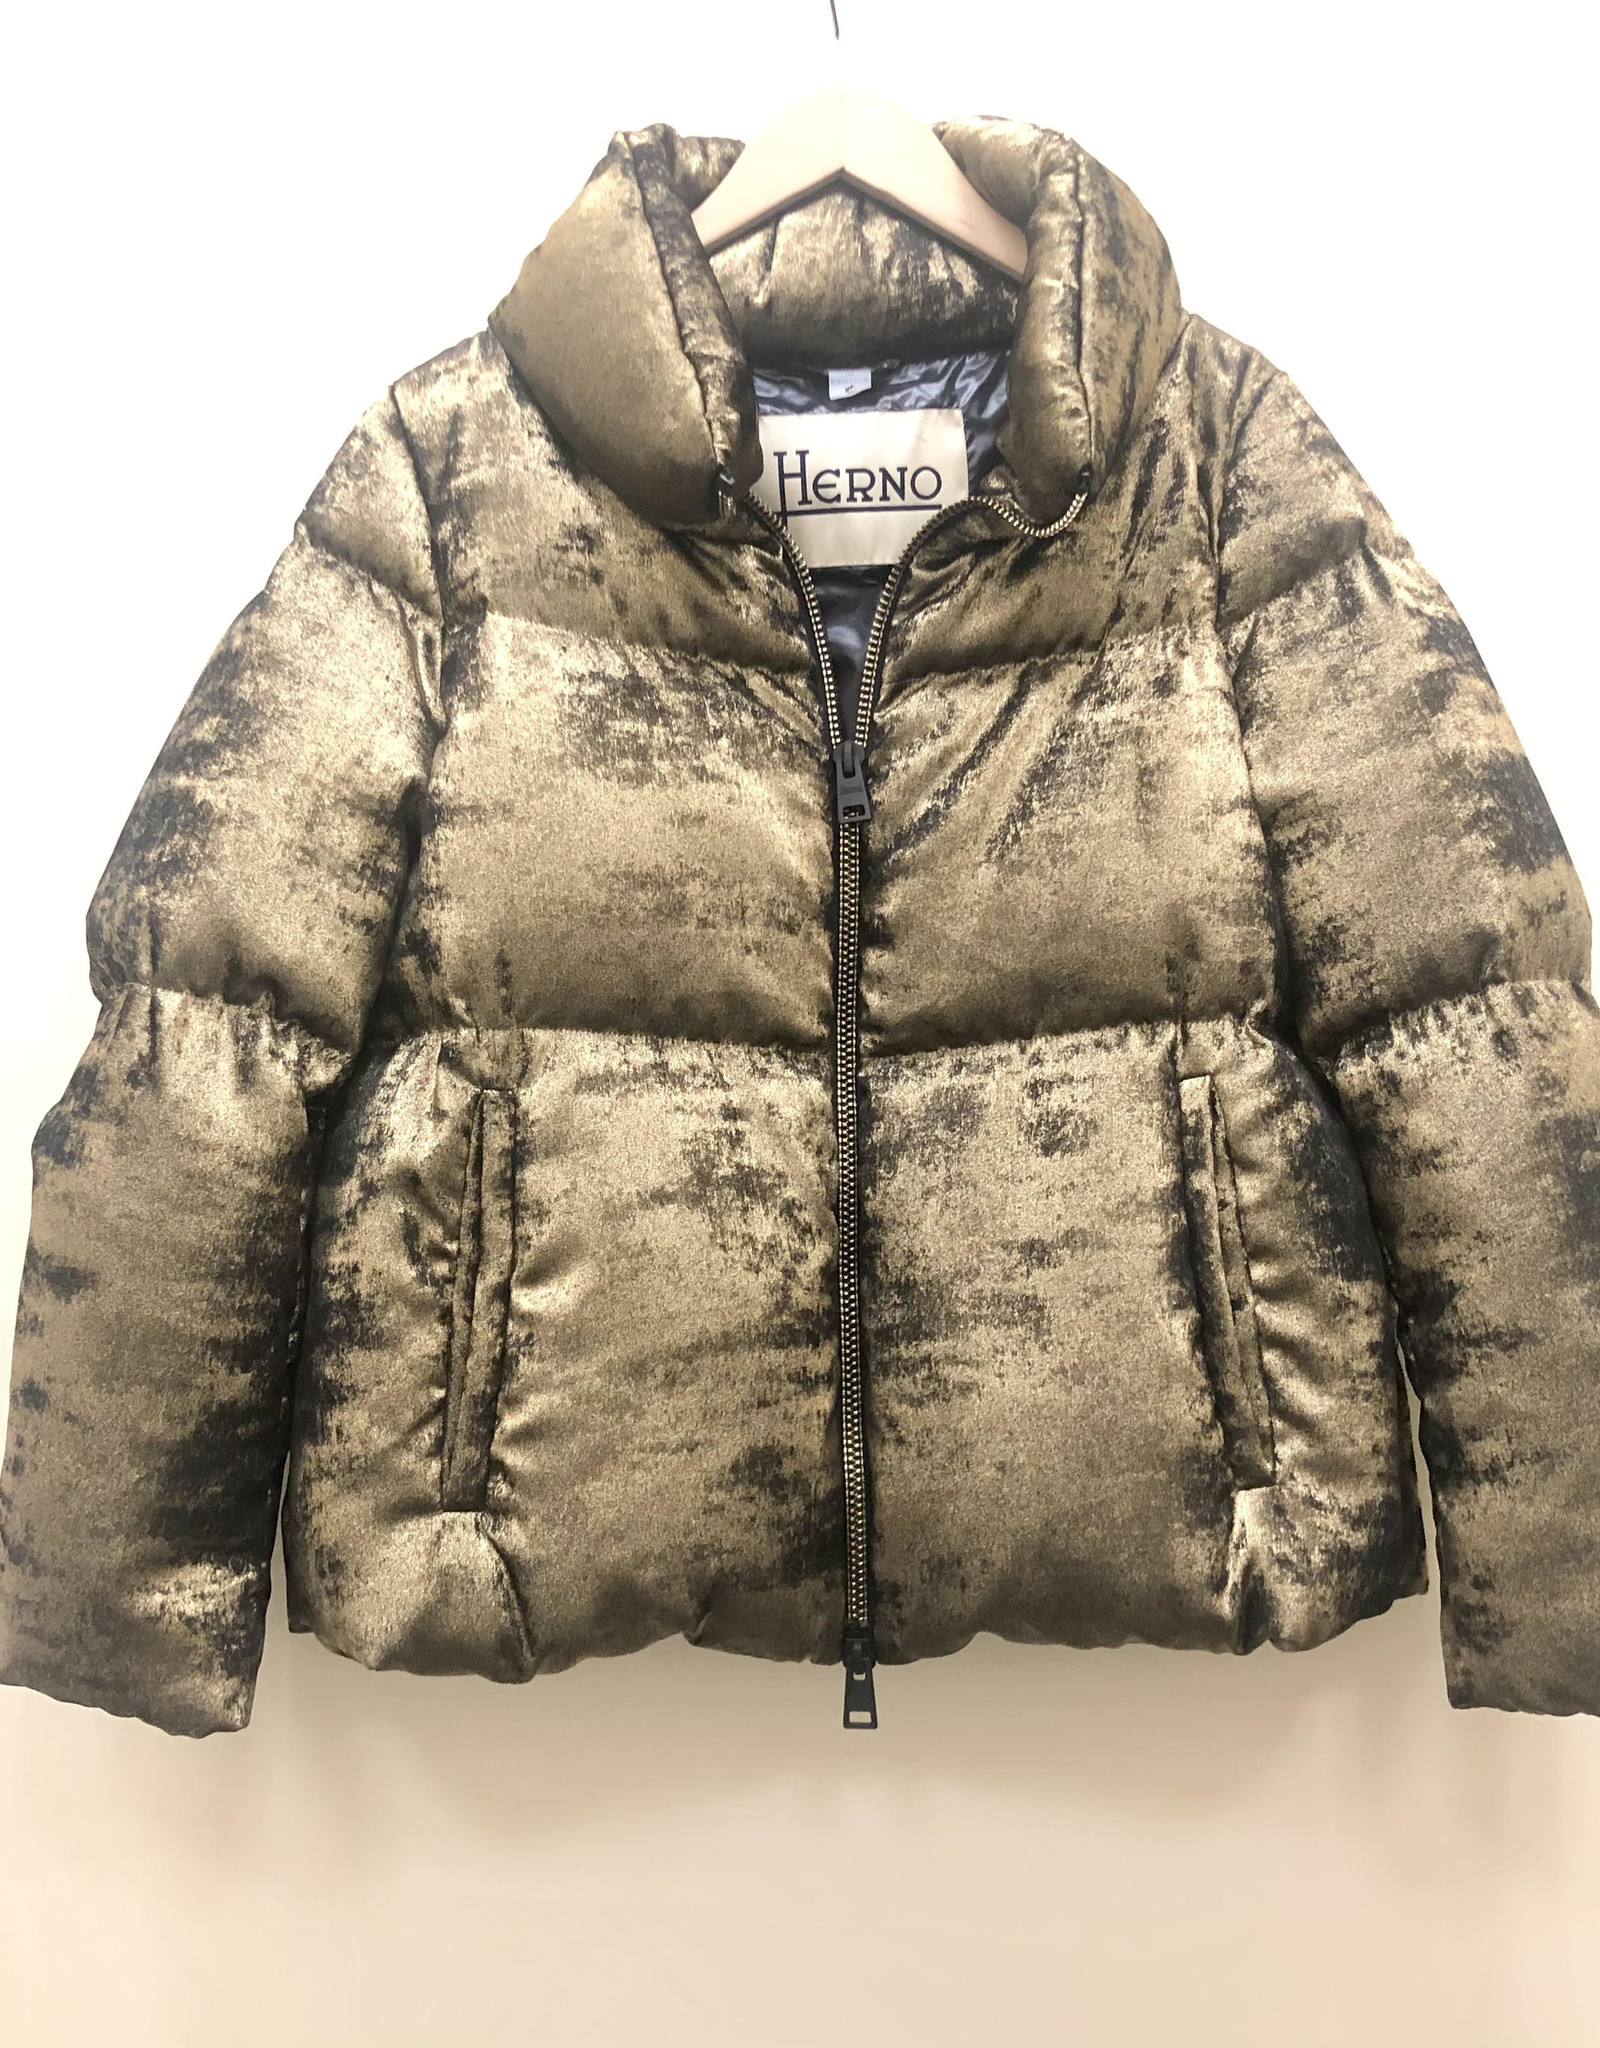 HERNO Metallic Puff Jacket